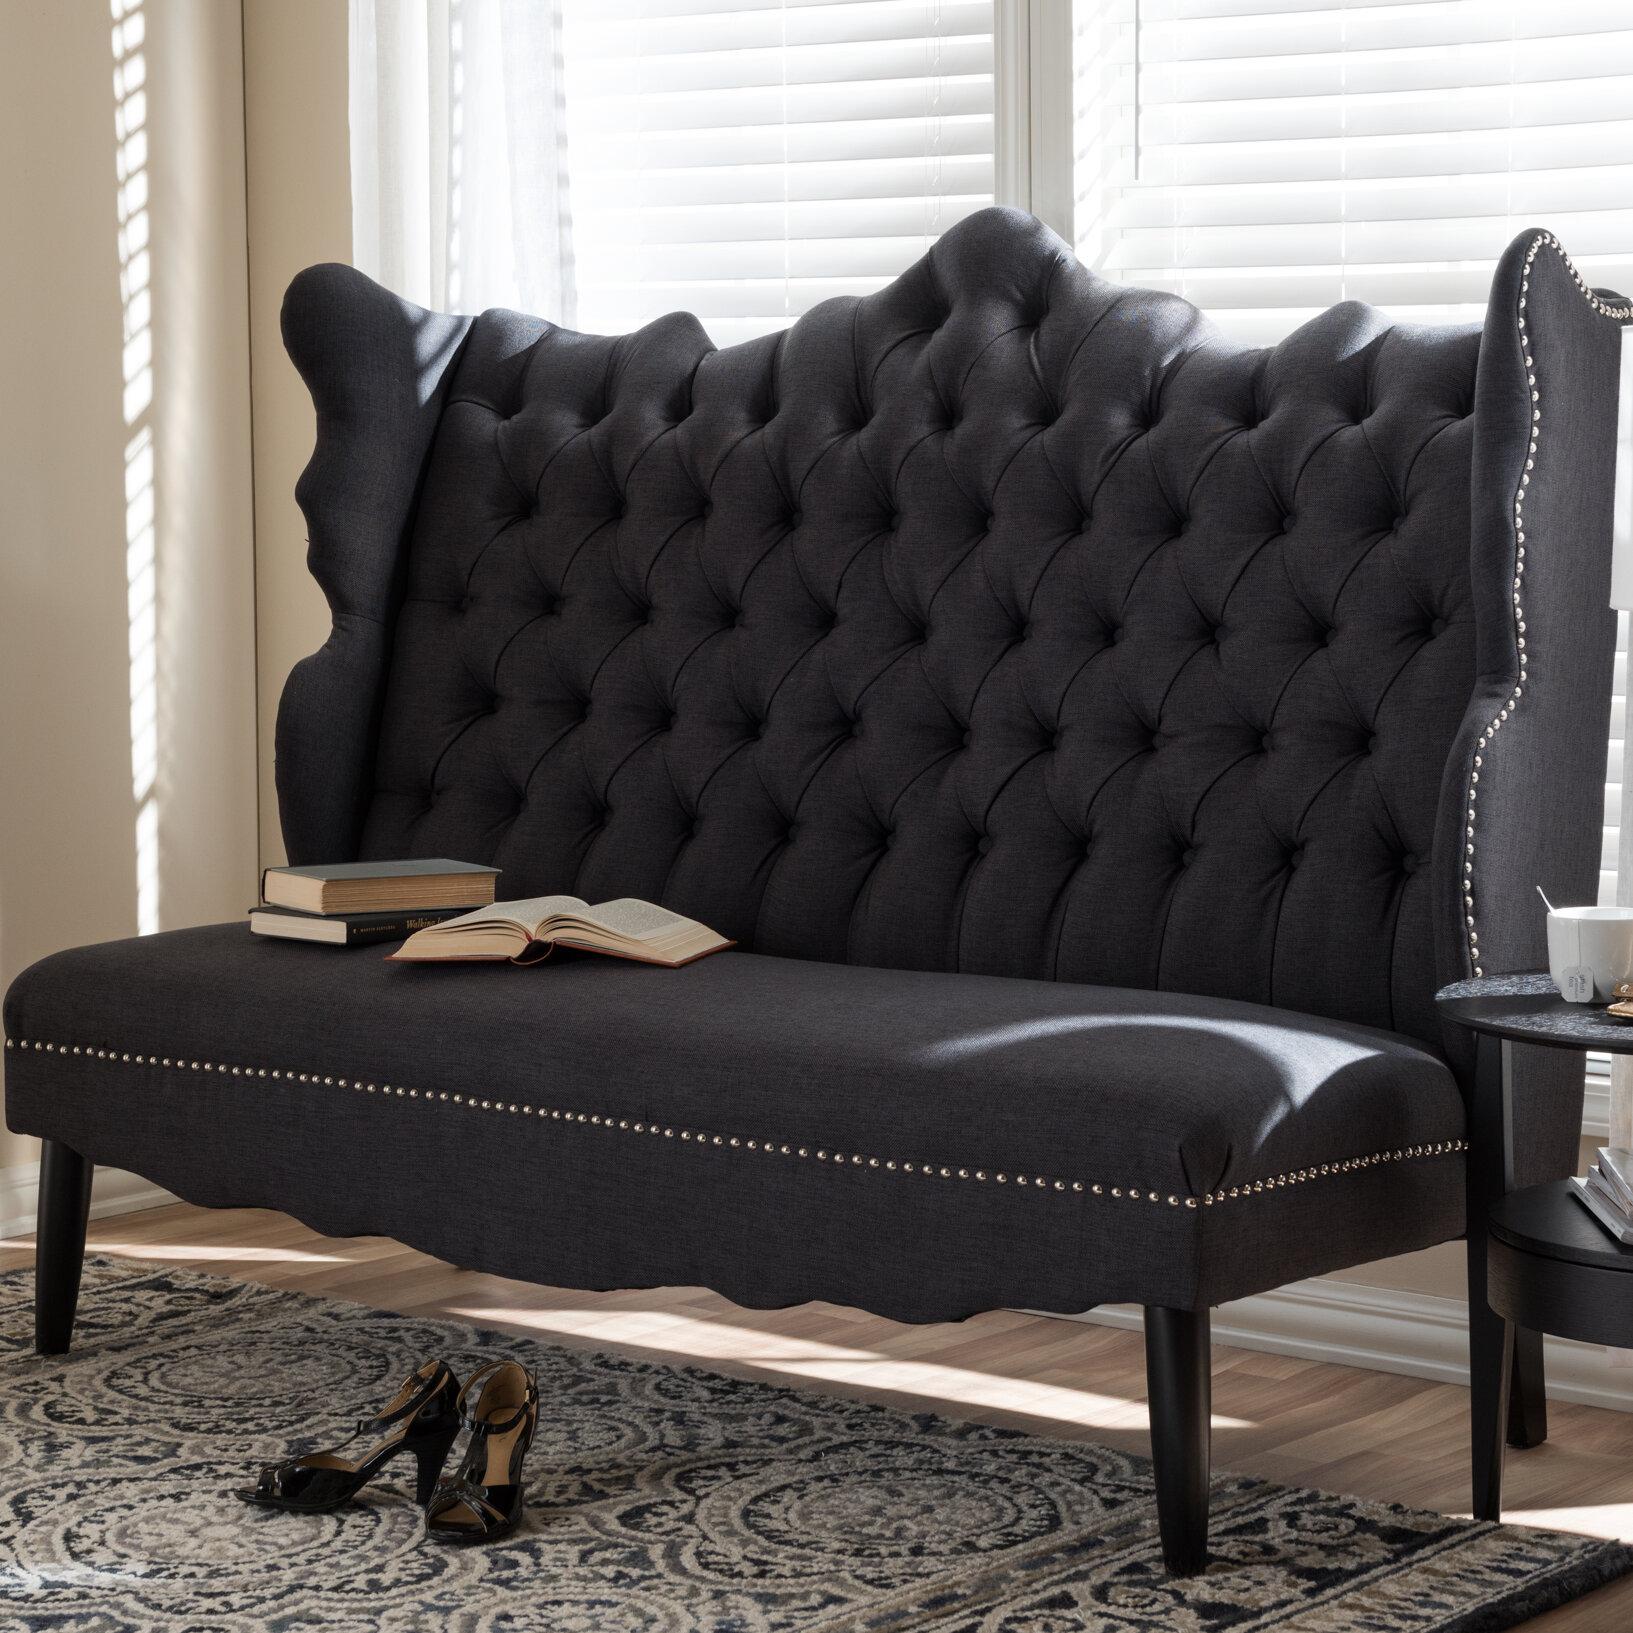 Magnificent Rosdorf Park Licata Upholstered Bench Ncnpc Chair Design For Home Ncnpcorg